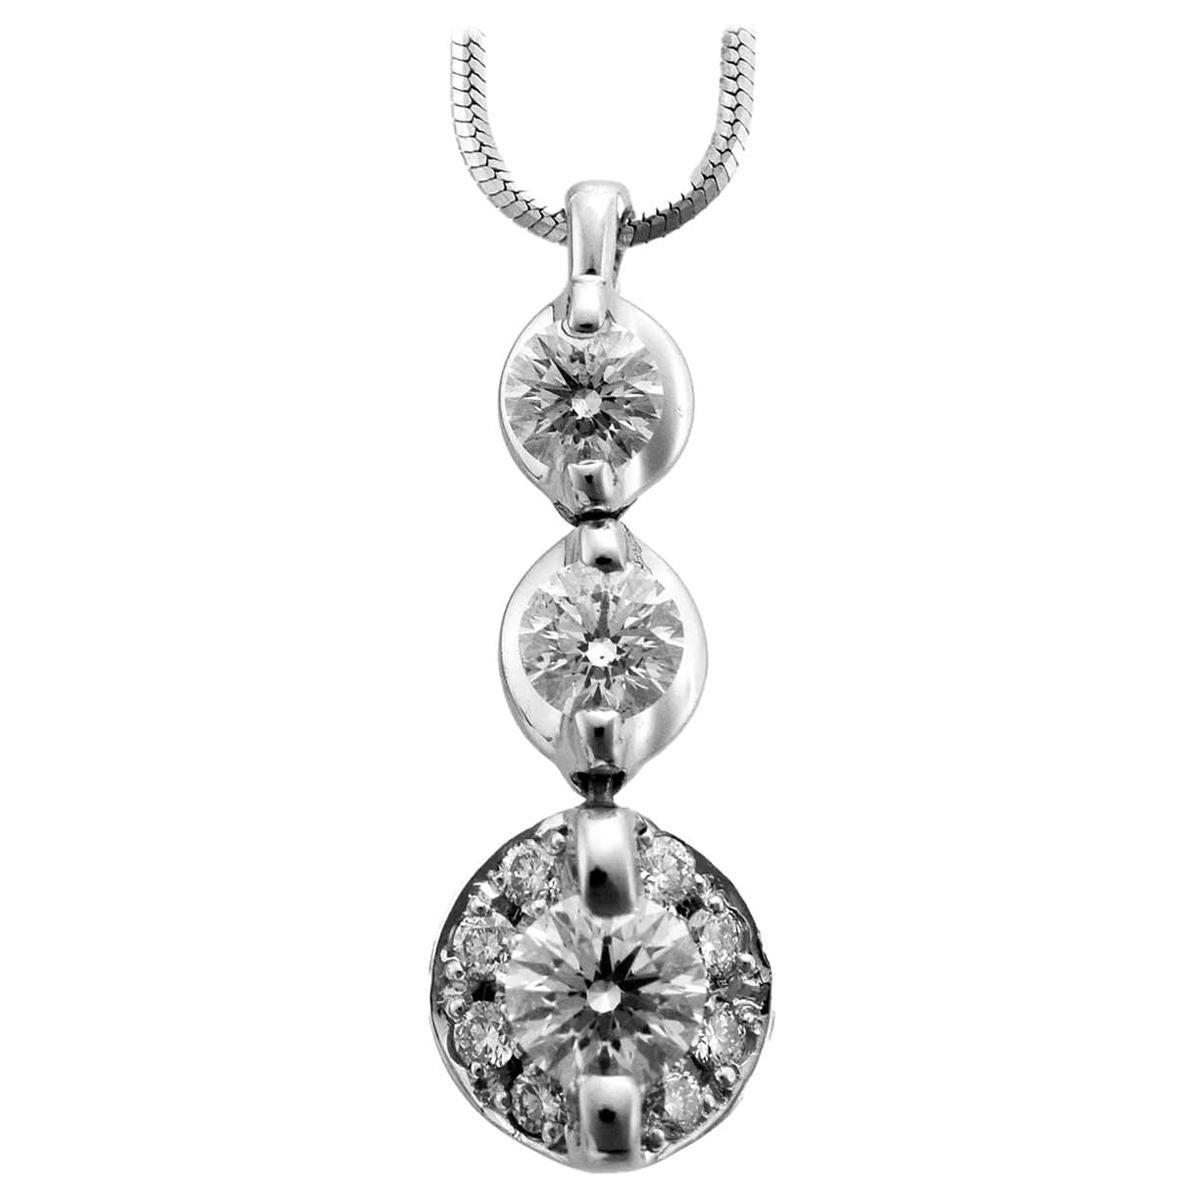 Trilogy 0.50 Carat / 0.50 Carat Diamond Platinum Pendant Necklace